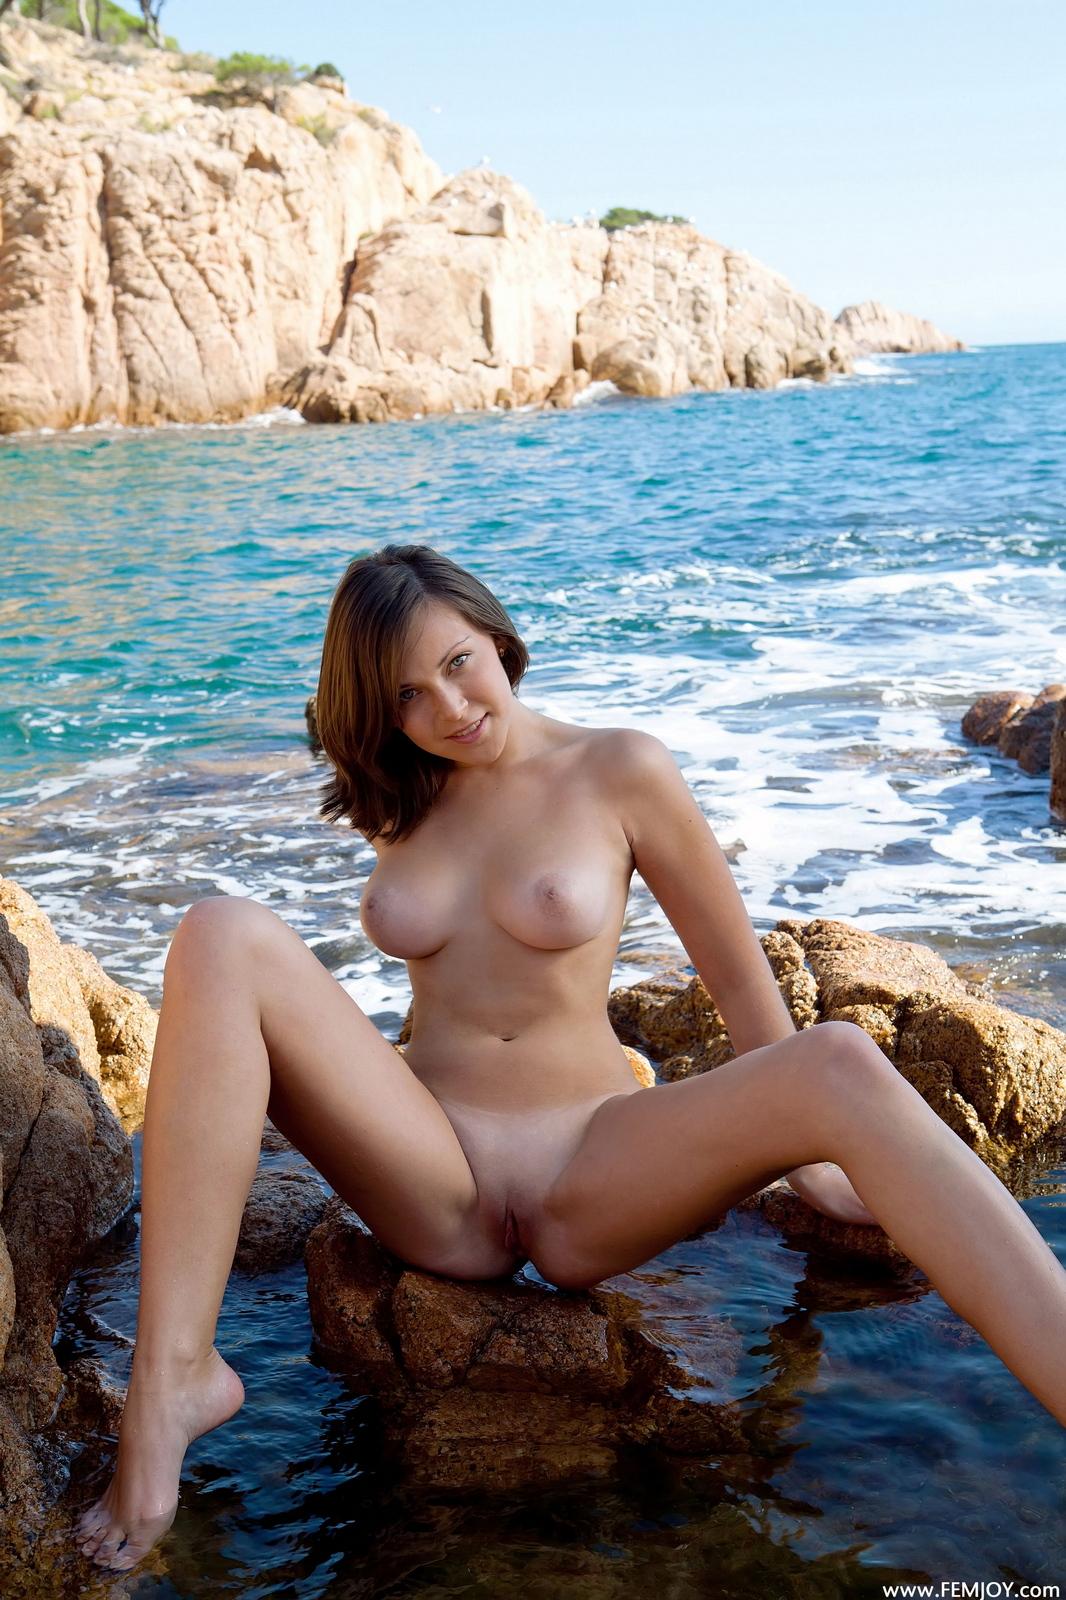 sophia-h-seaside-naked-boobs-rocks-femjoy-16